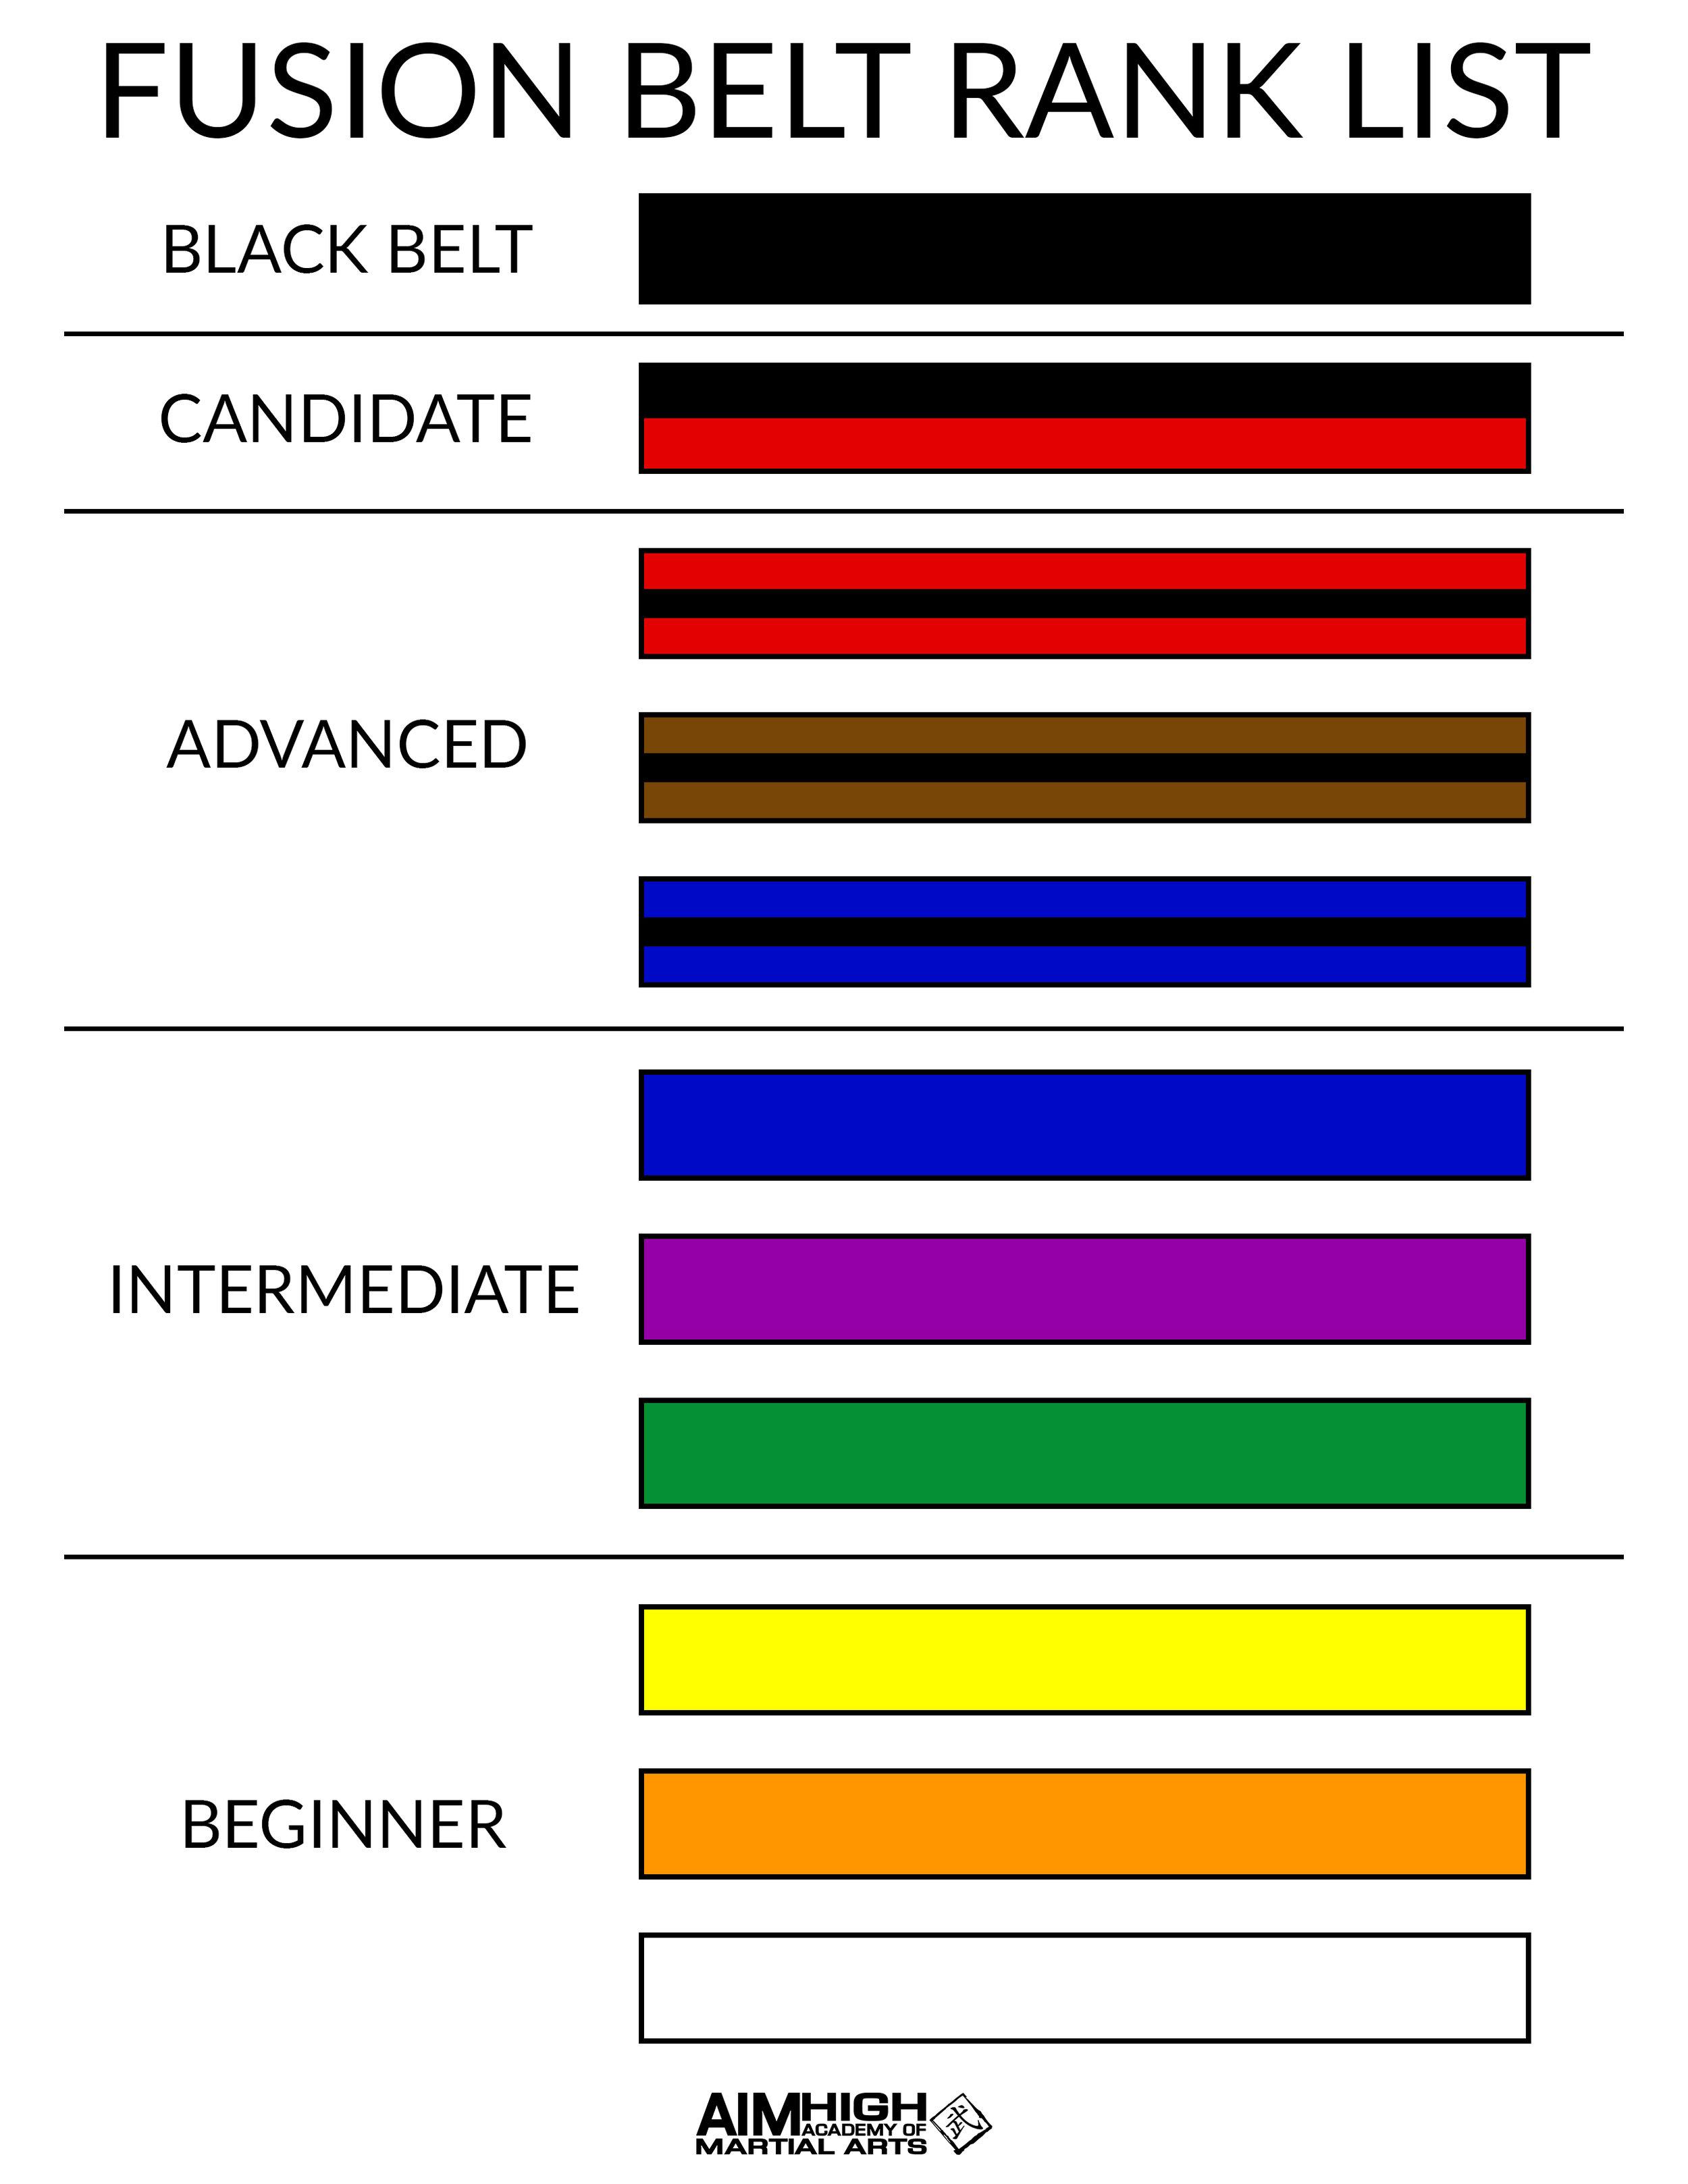 Fusion Belt Rank List.jpg